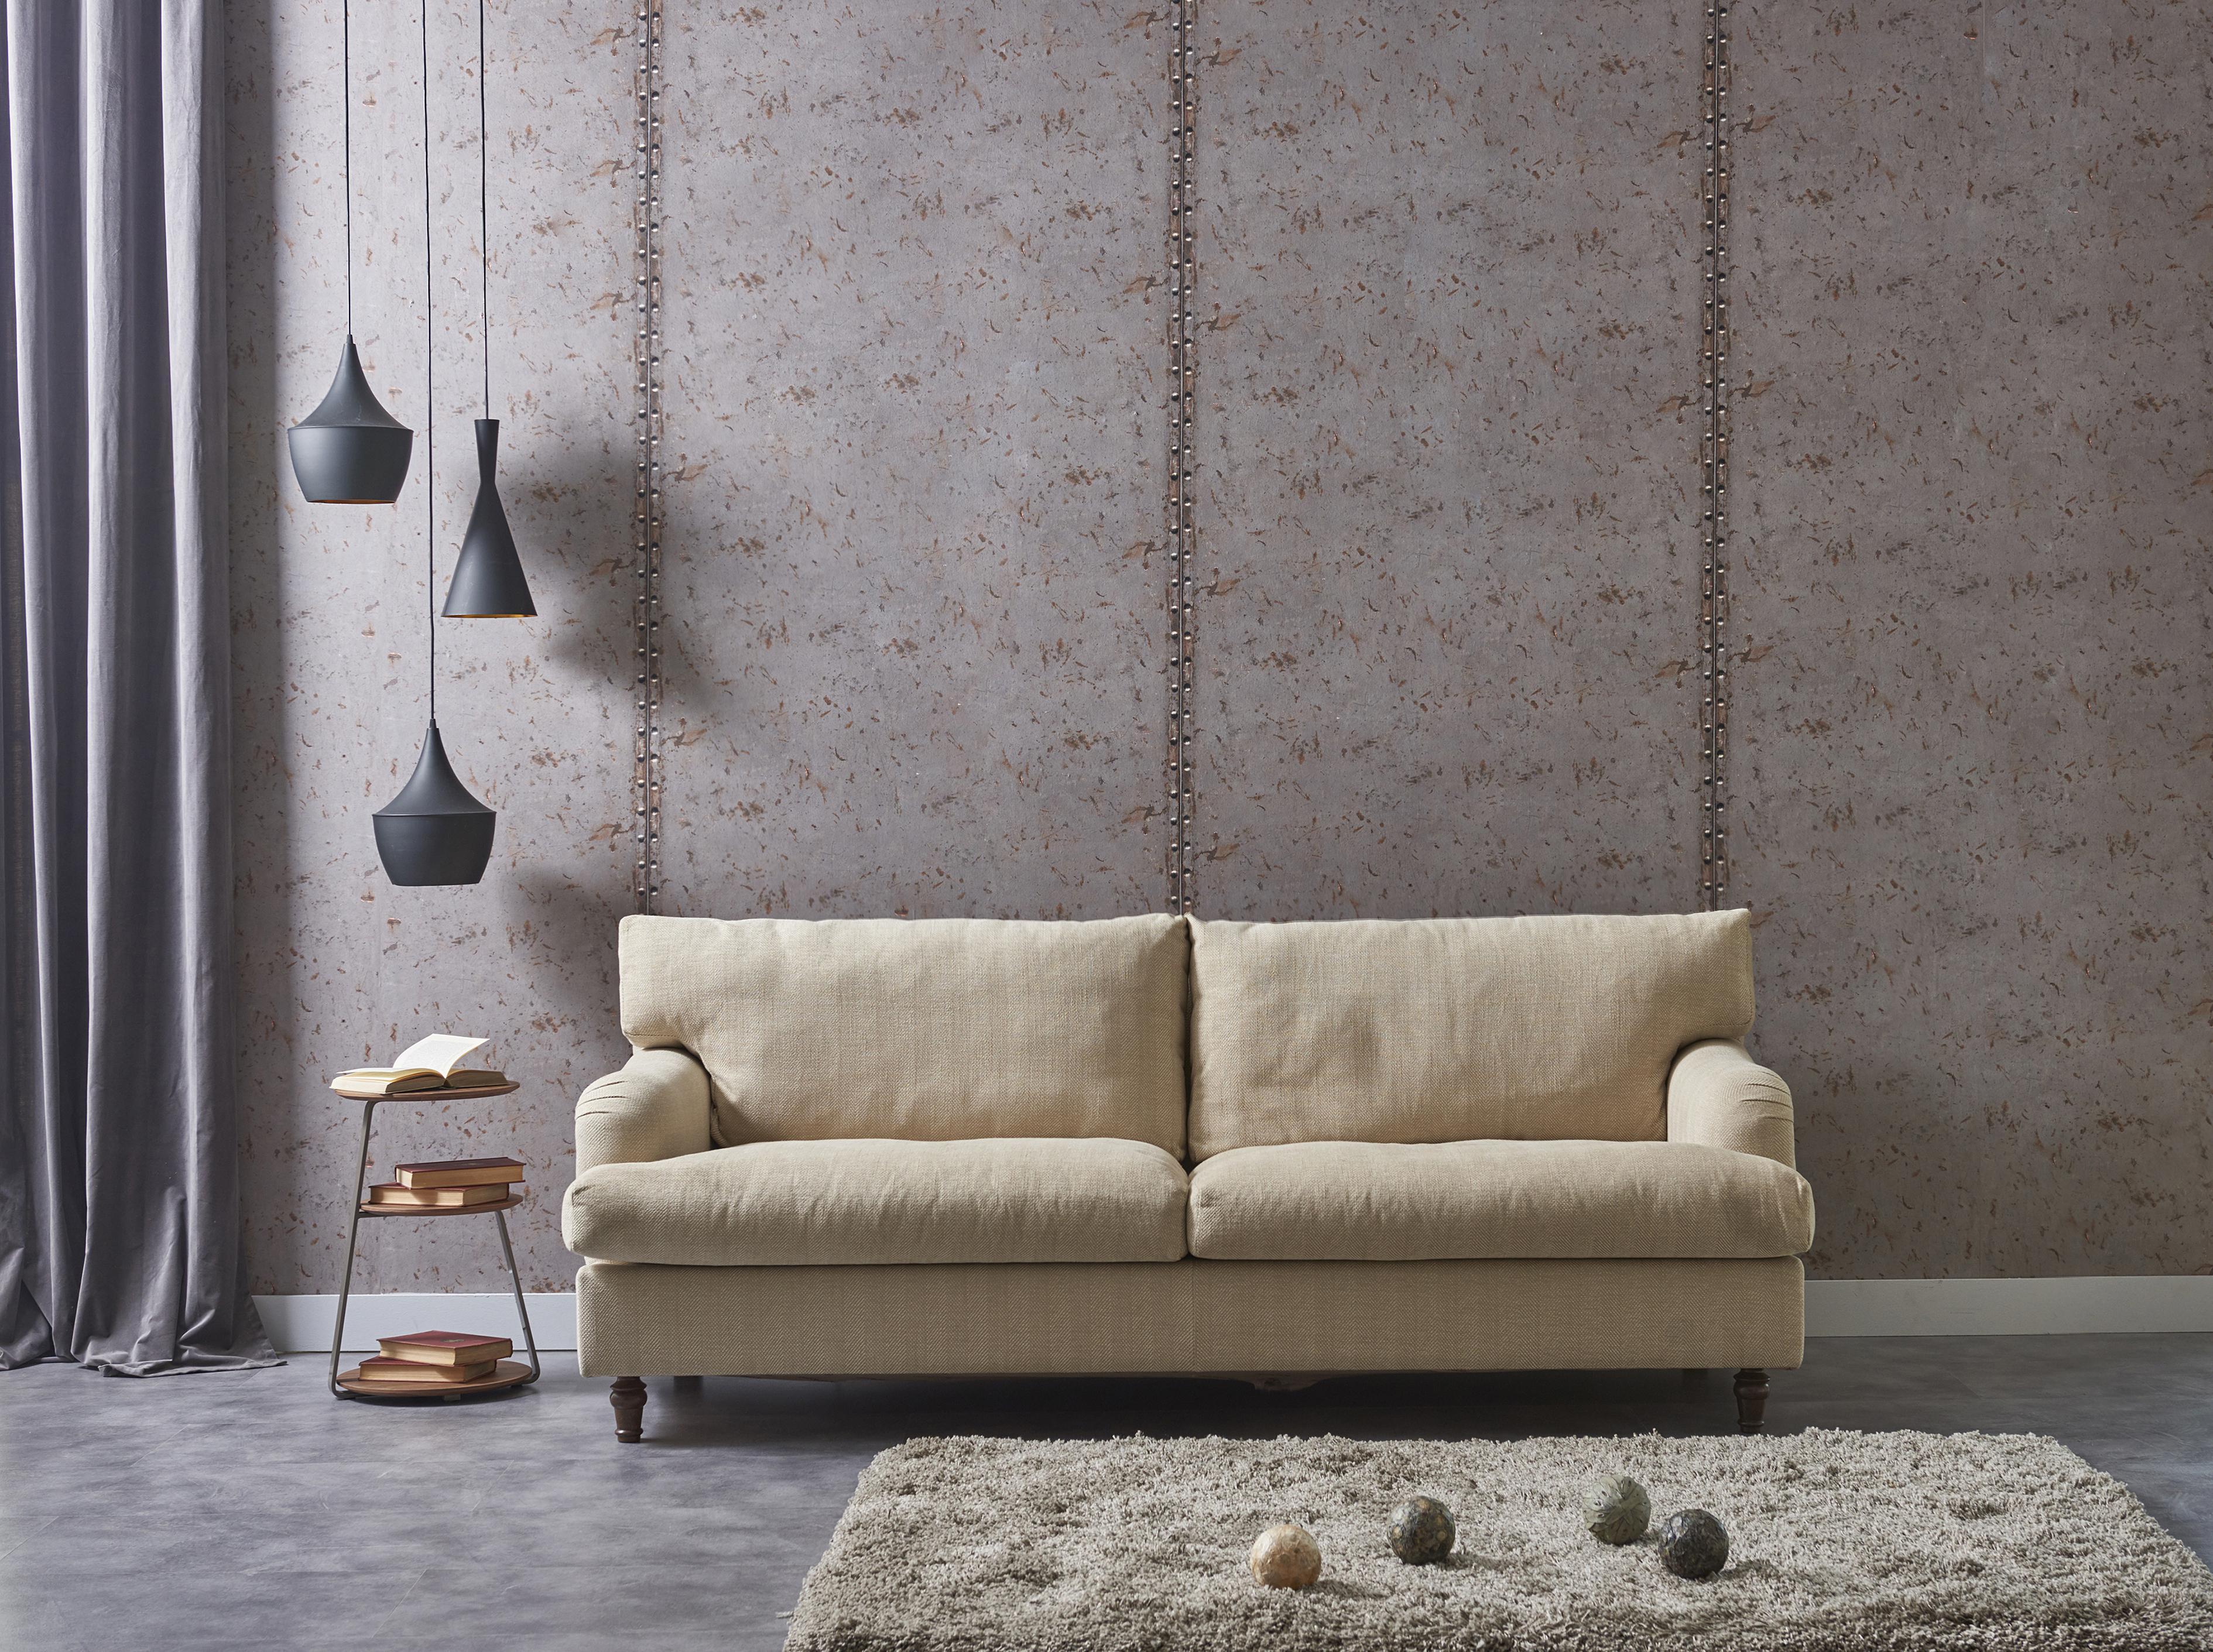 Серый пол и серые стены